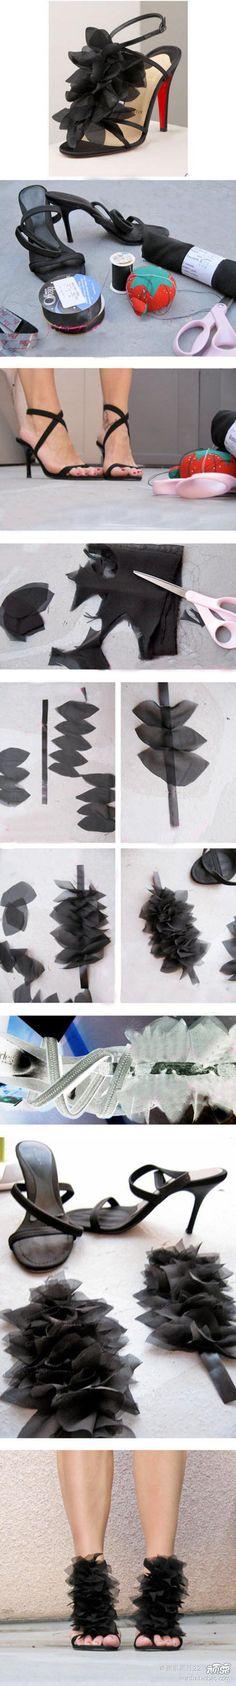 Christian louboutin petal sandals tutorial